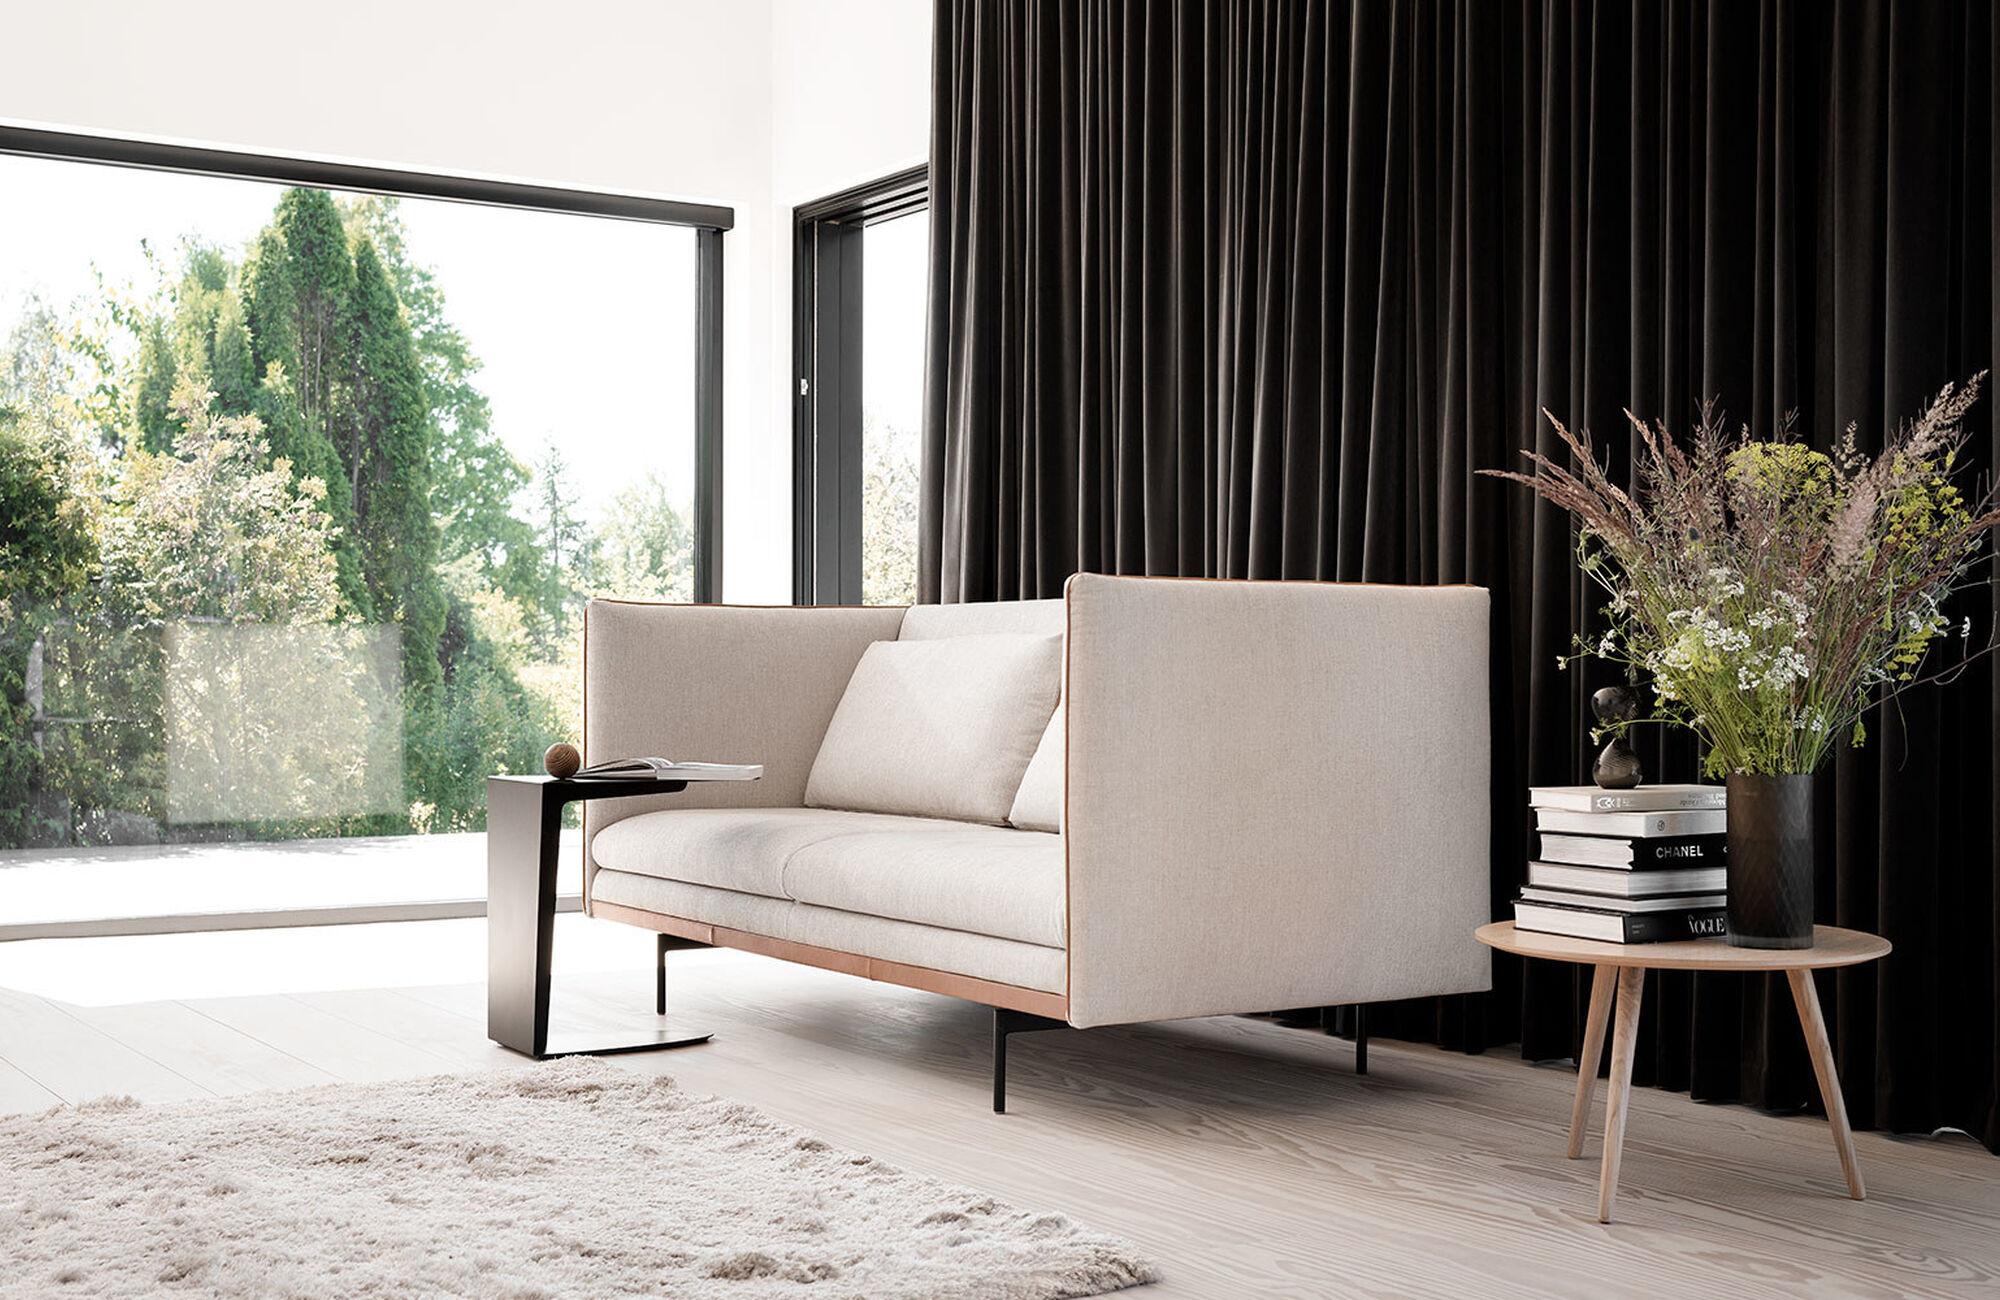 Furniture accessories - Nantes sofa cushions